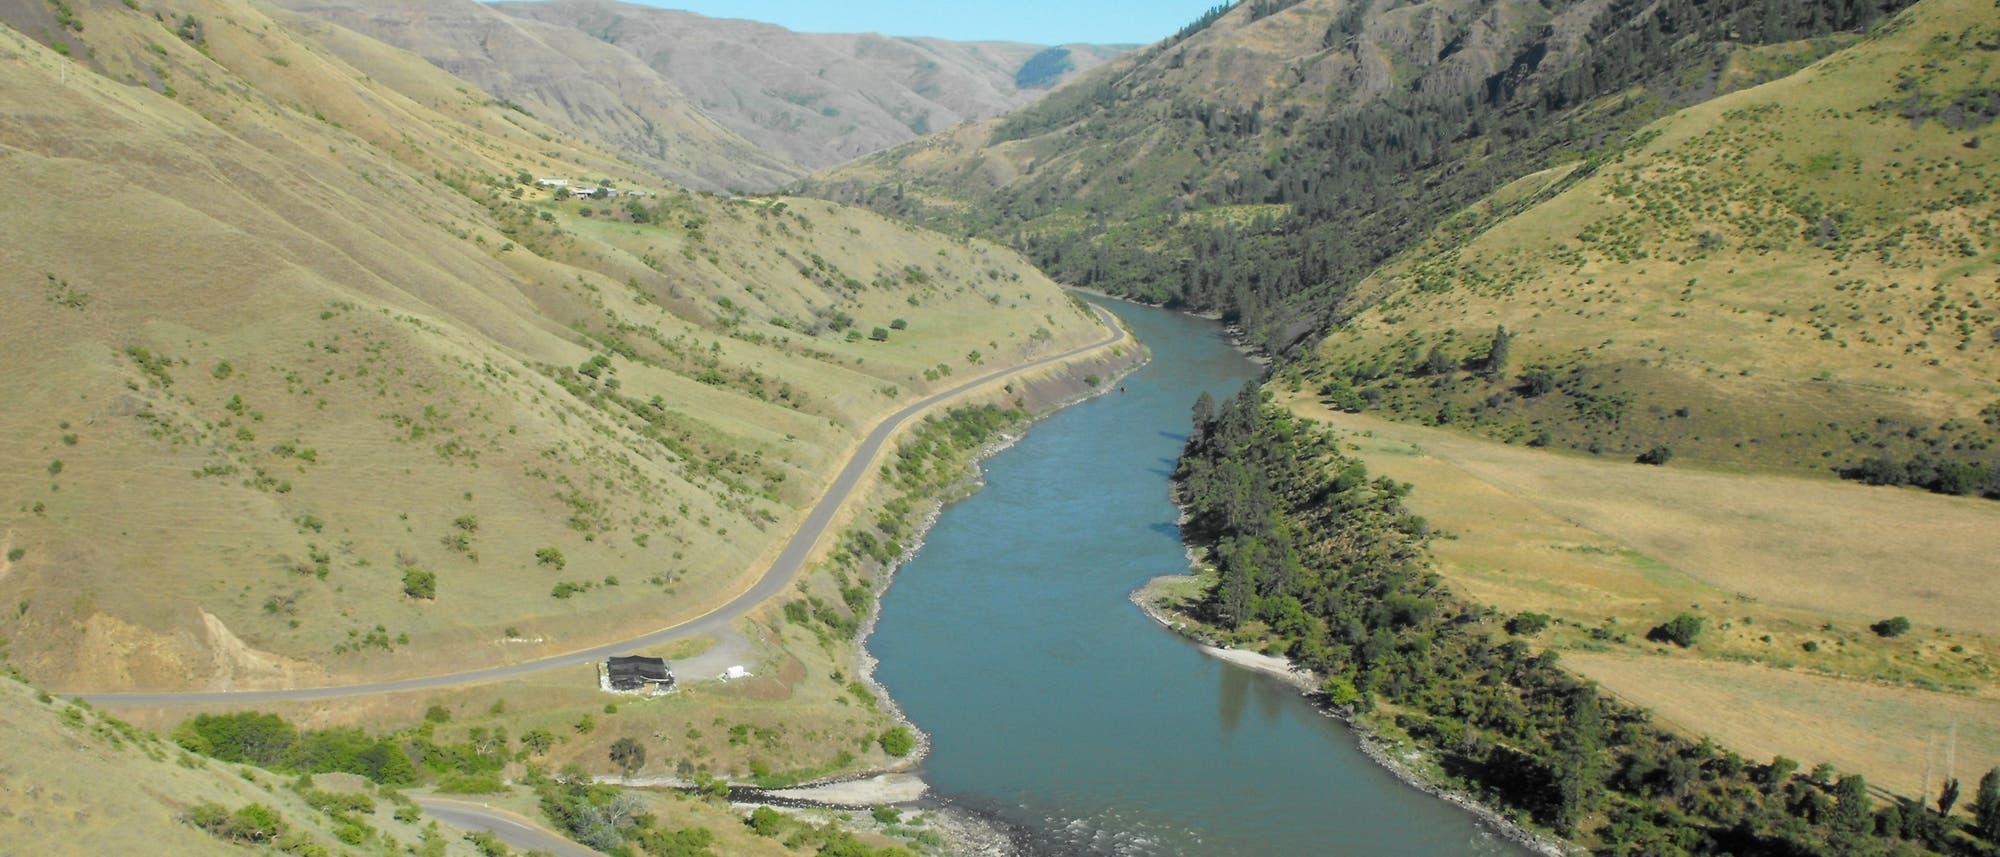 Der Fundort Cooper's Ferry am Salmon River